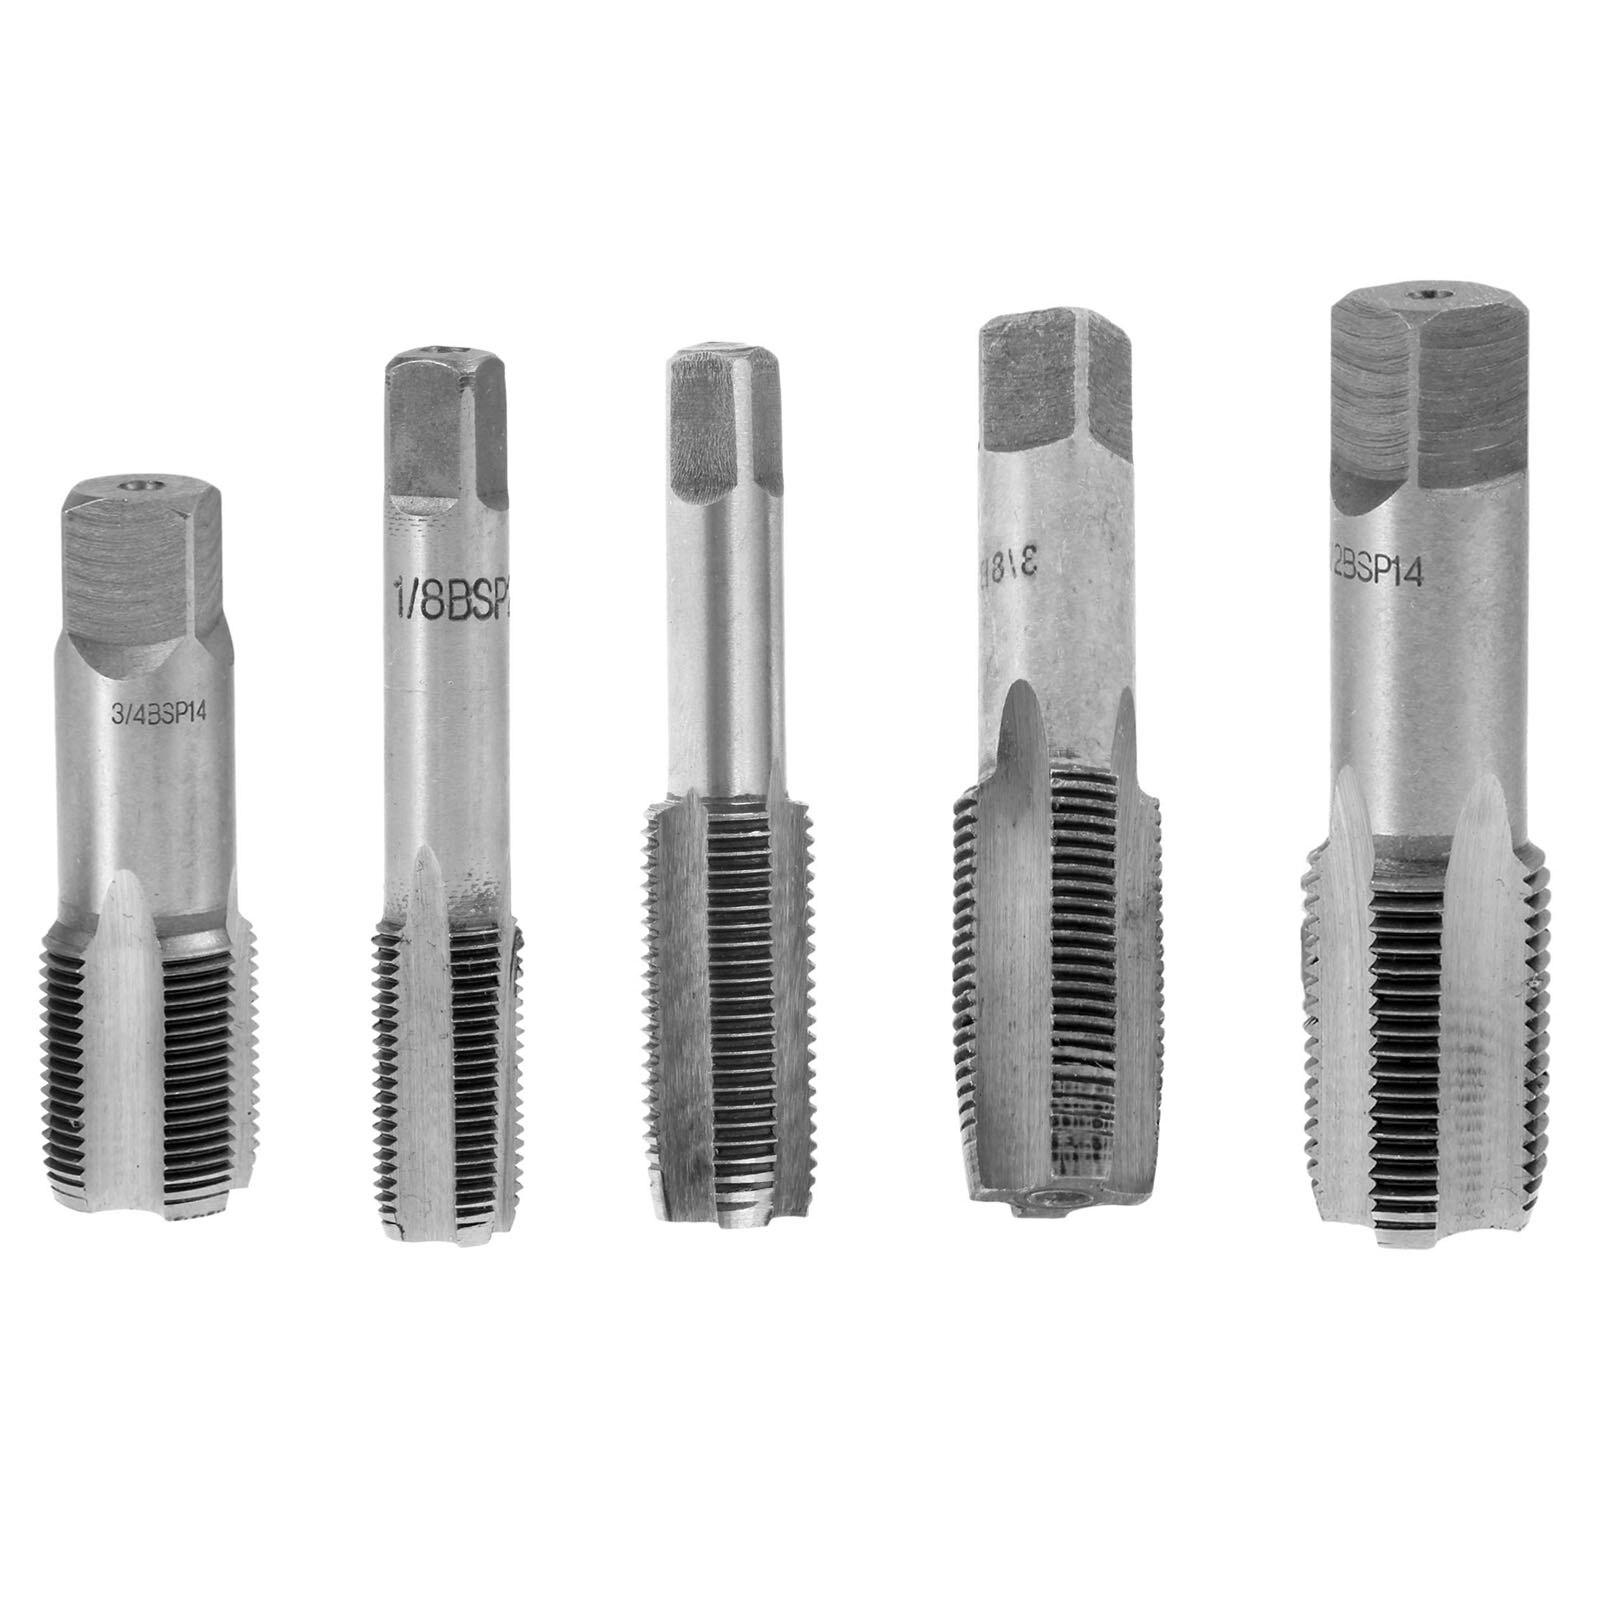 DRELD 1Pc HSS Piping Thread Tap 1/8 1/4 3/8 1/2 3/4 Inch Taper Pipe Tap BSP Metal Screw Thread Cutting Repair Hand Tools